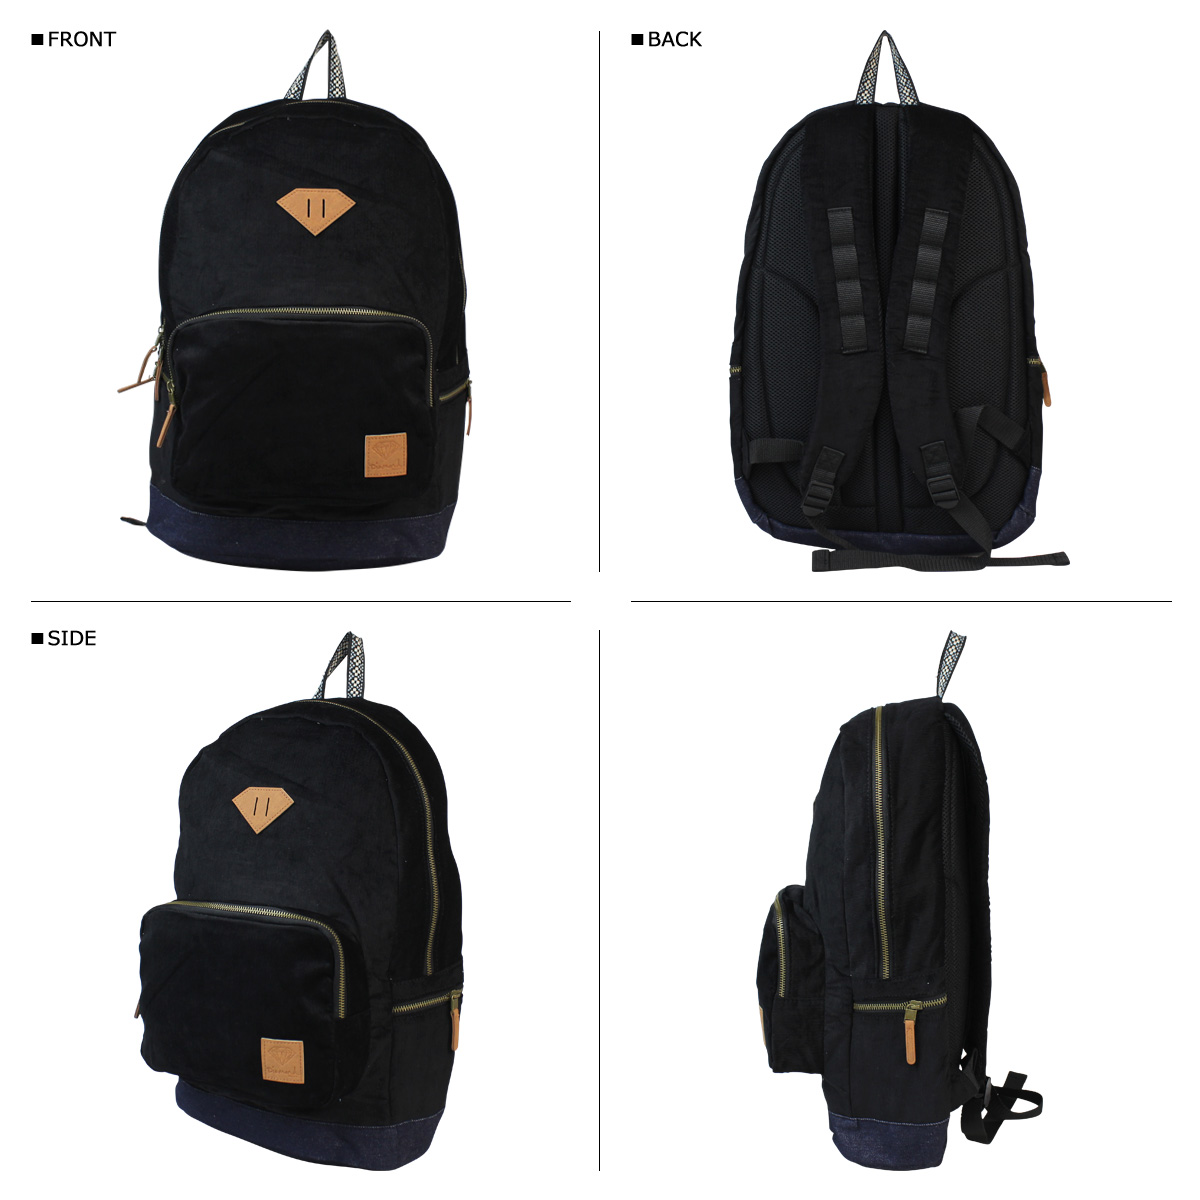 Diamond supply Diamond Supply Co men's backpack rucksack NATIVE BACKPACK [11 / 9 new in stock]